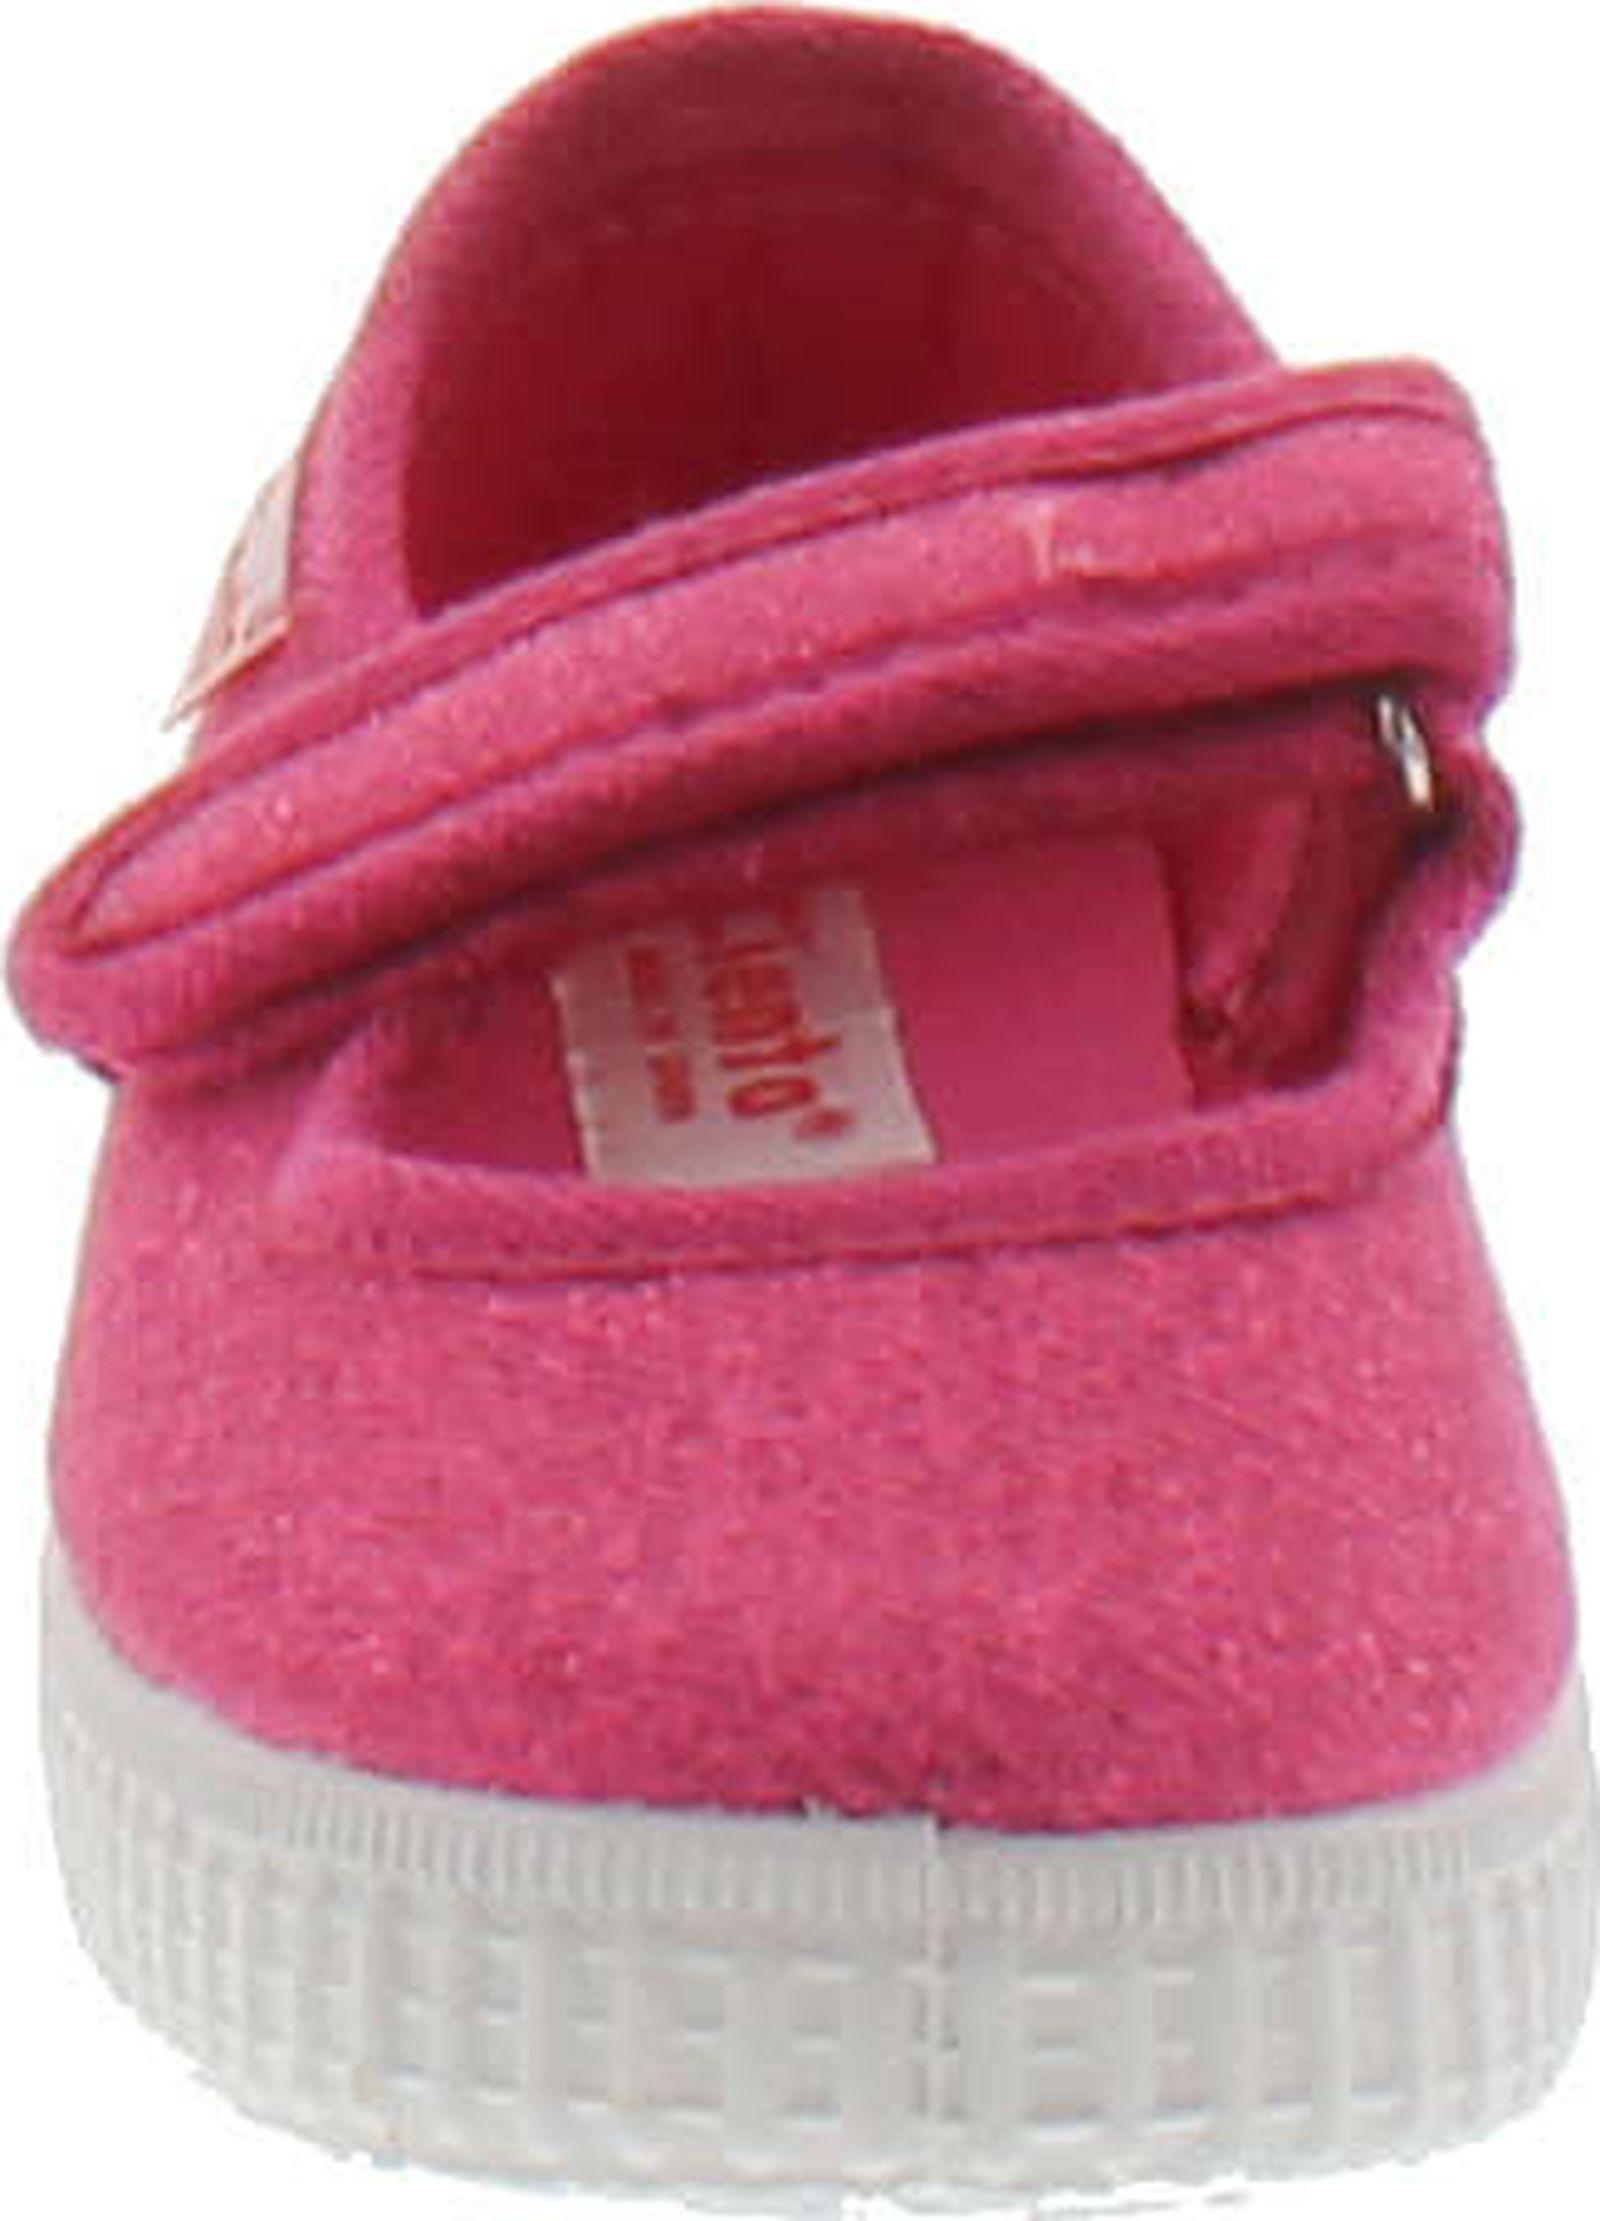 Cienta Kids 133027.23 Slipper